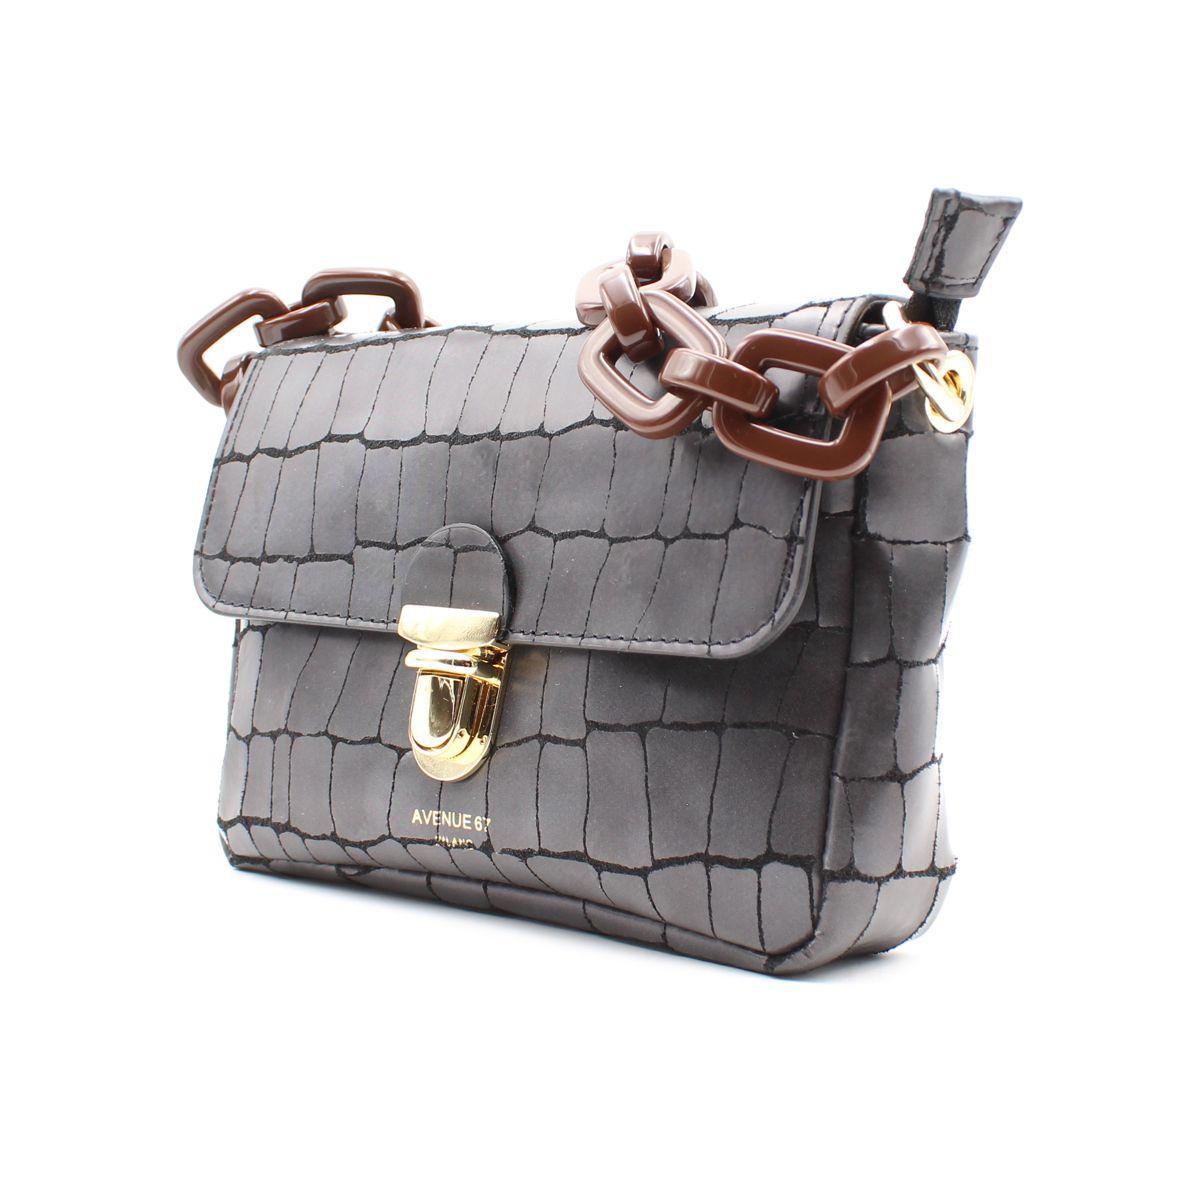 Bag Black Avenue 67